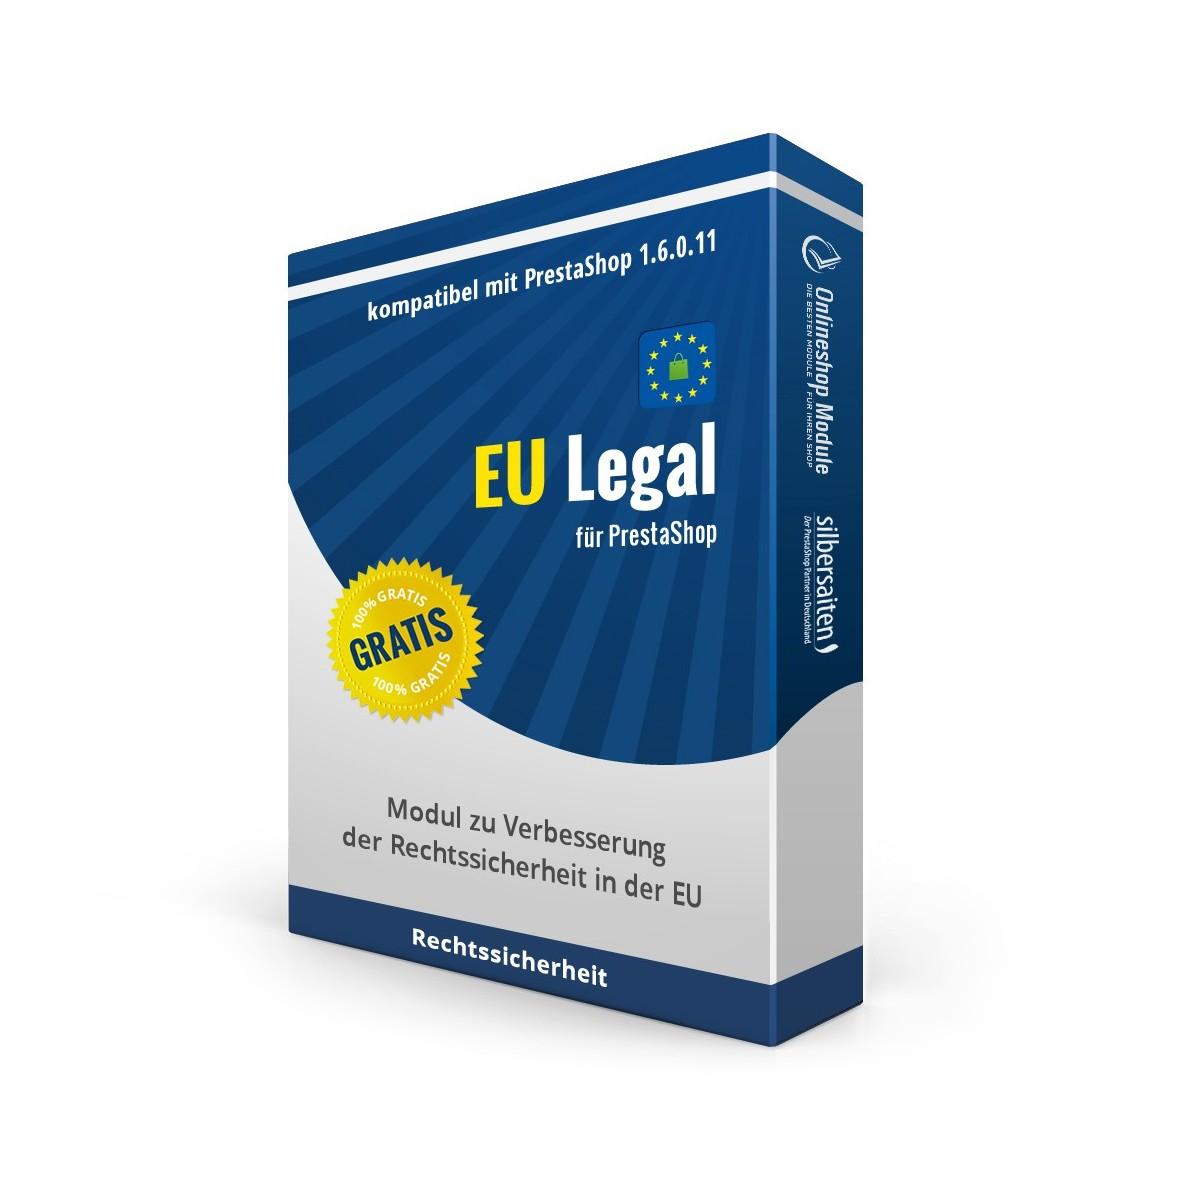 EU-Legal für PrestaShop 1.6.0.11